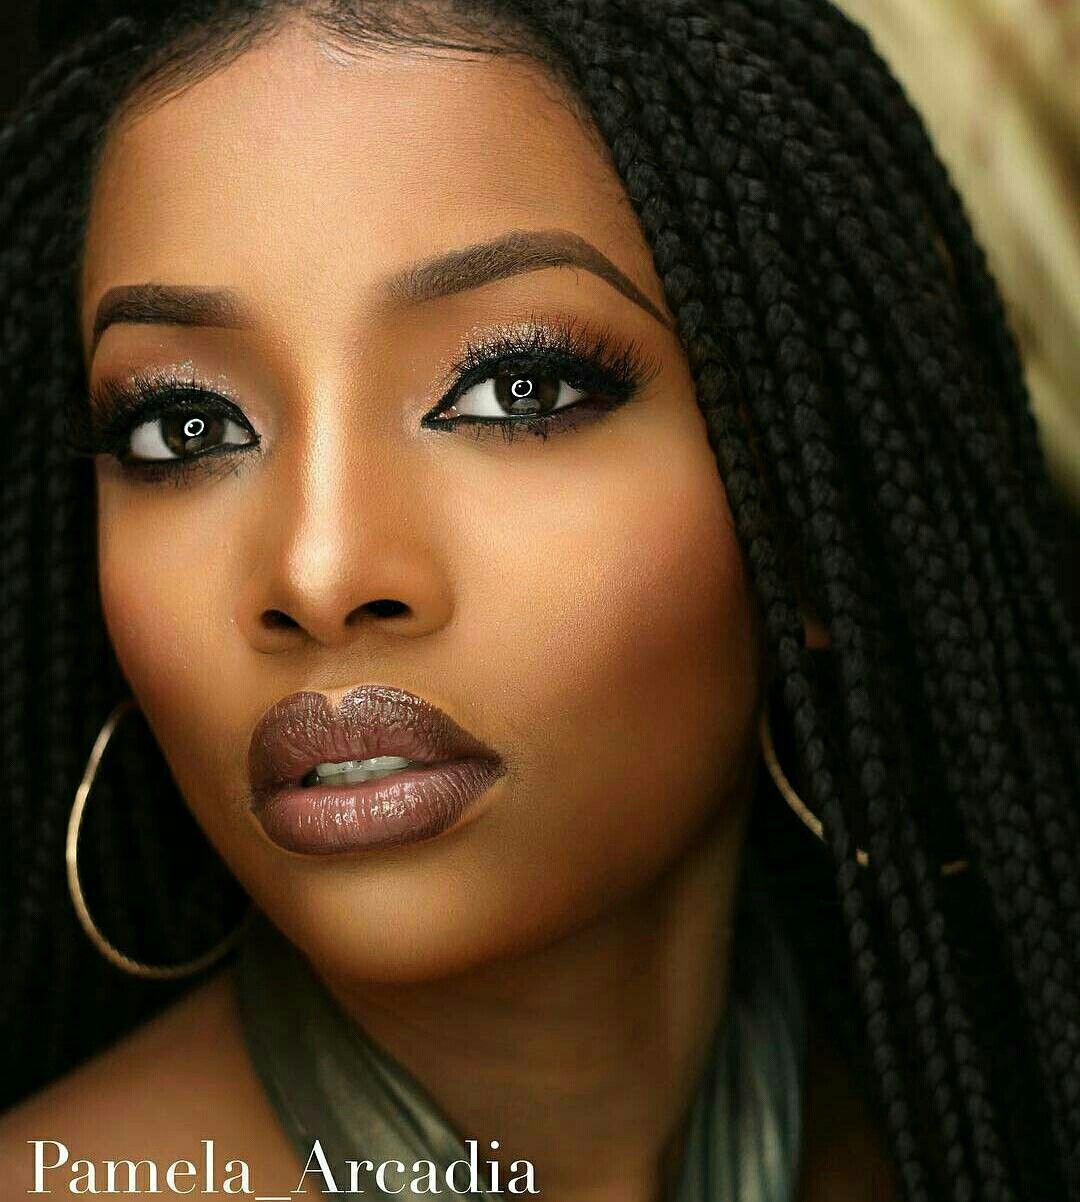 Pin by Lee Seneschal on Beauty Black girl makeup, Black